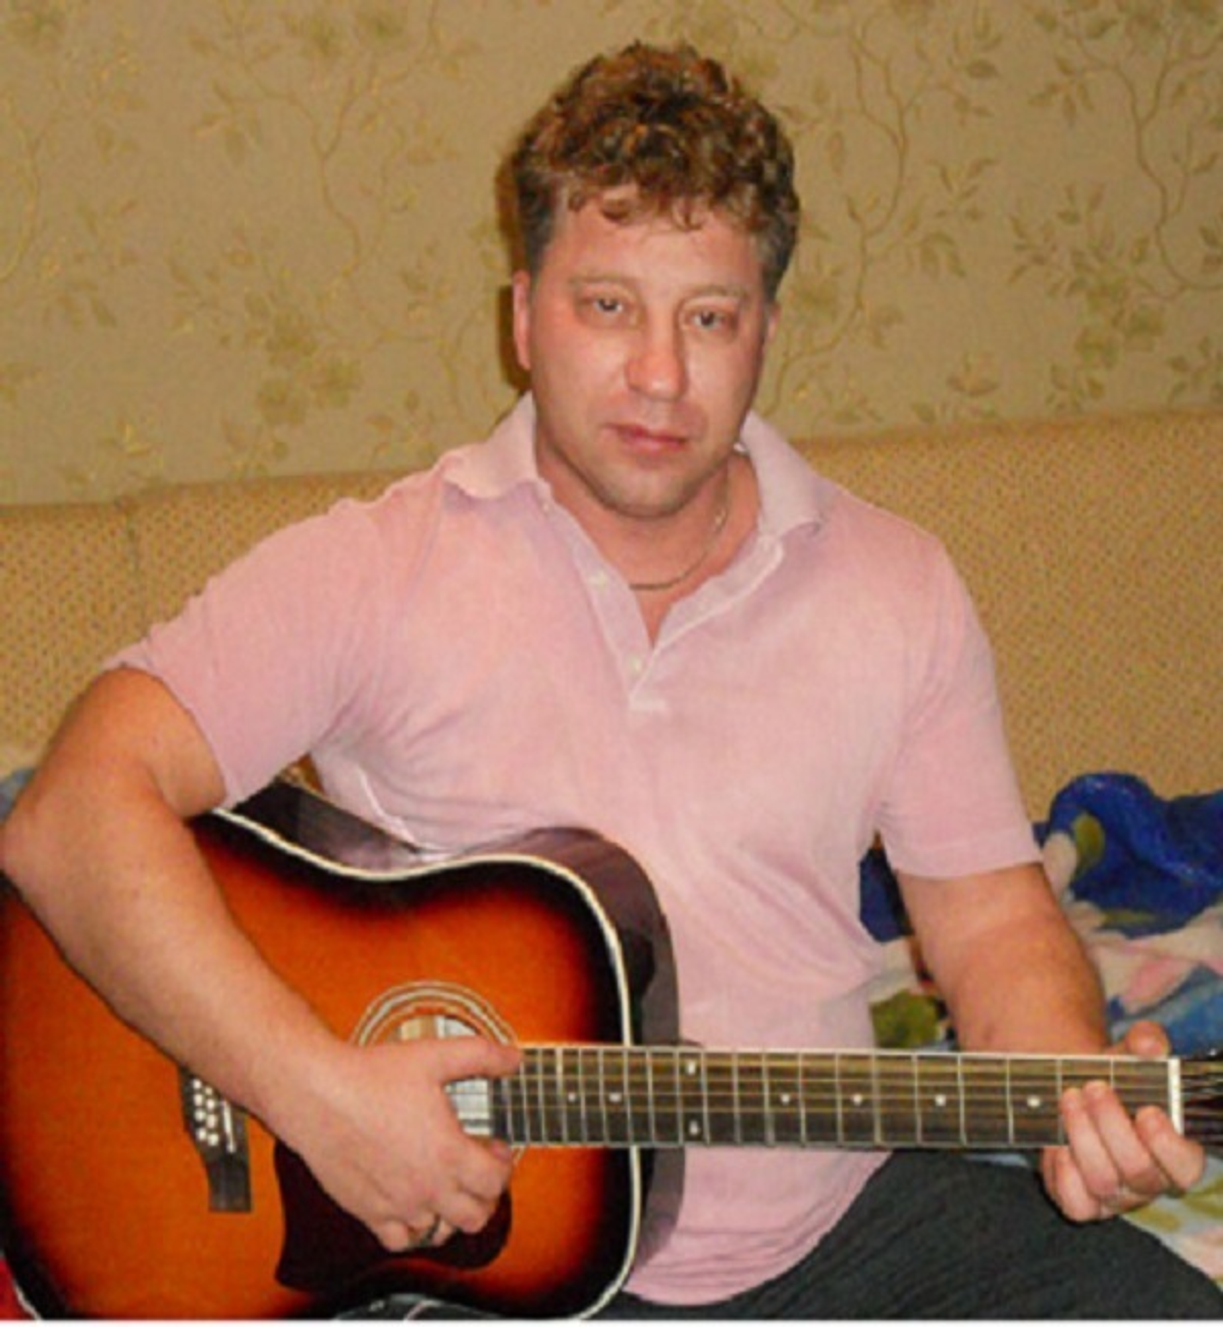 Никитин Алексей Сергеевич